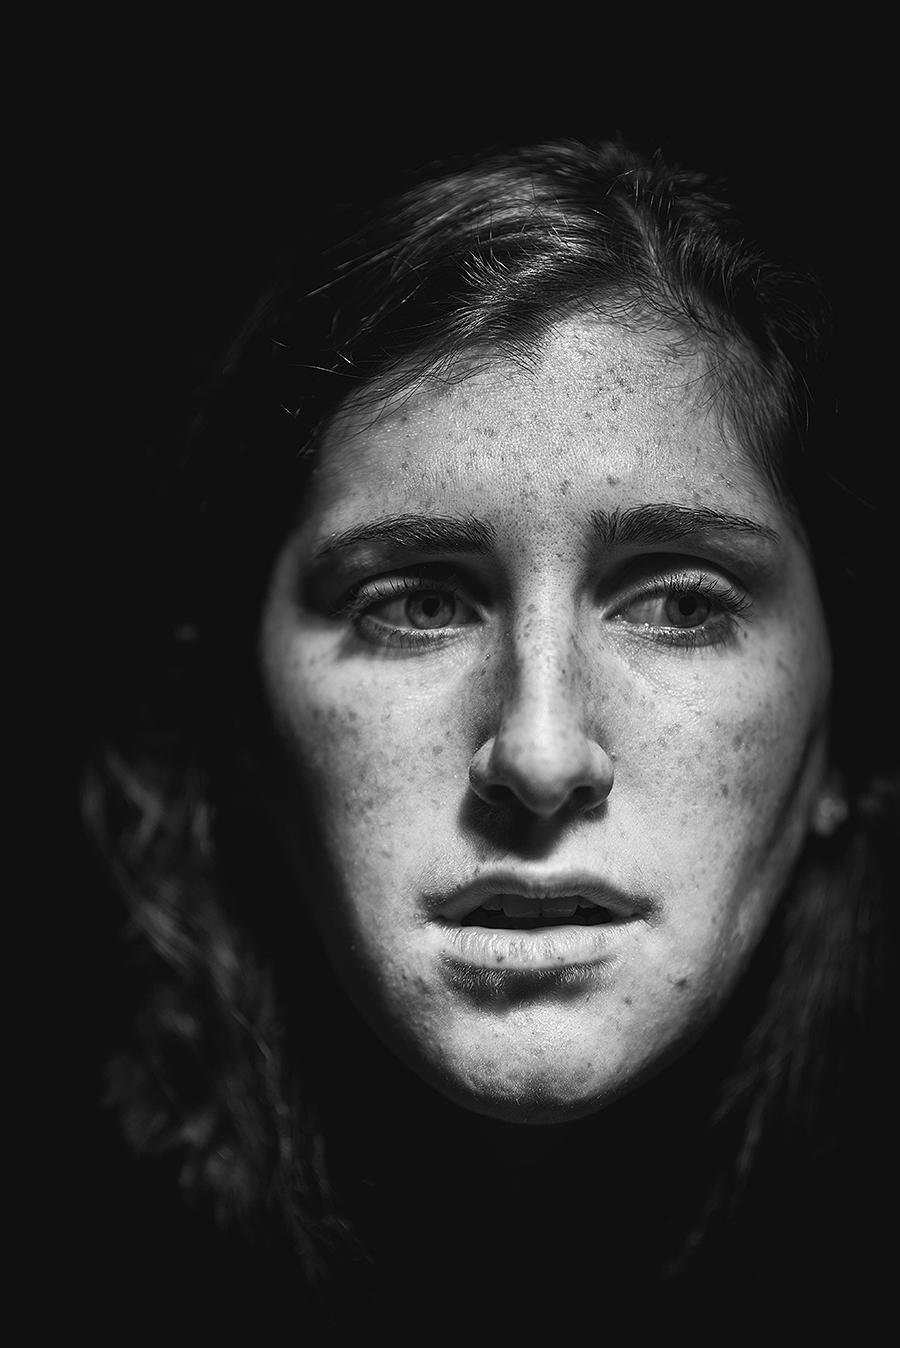 Abbie_despair_photography_model_photo_emotion_portrait_headshot_kaleb_germinaro